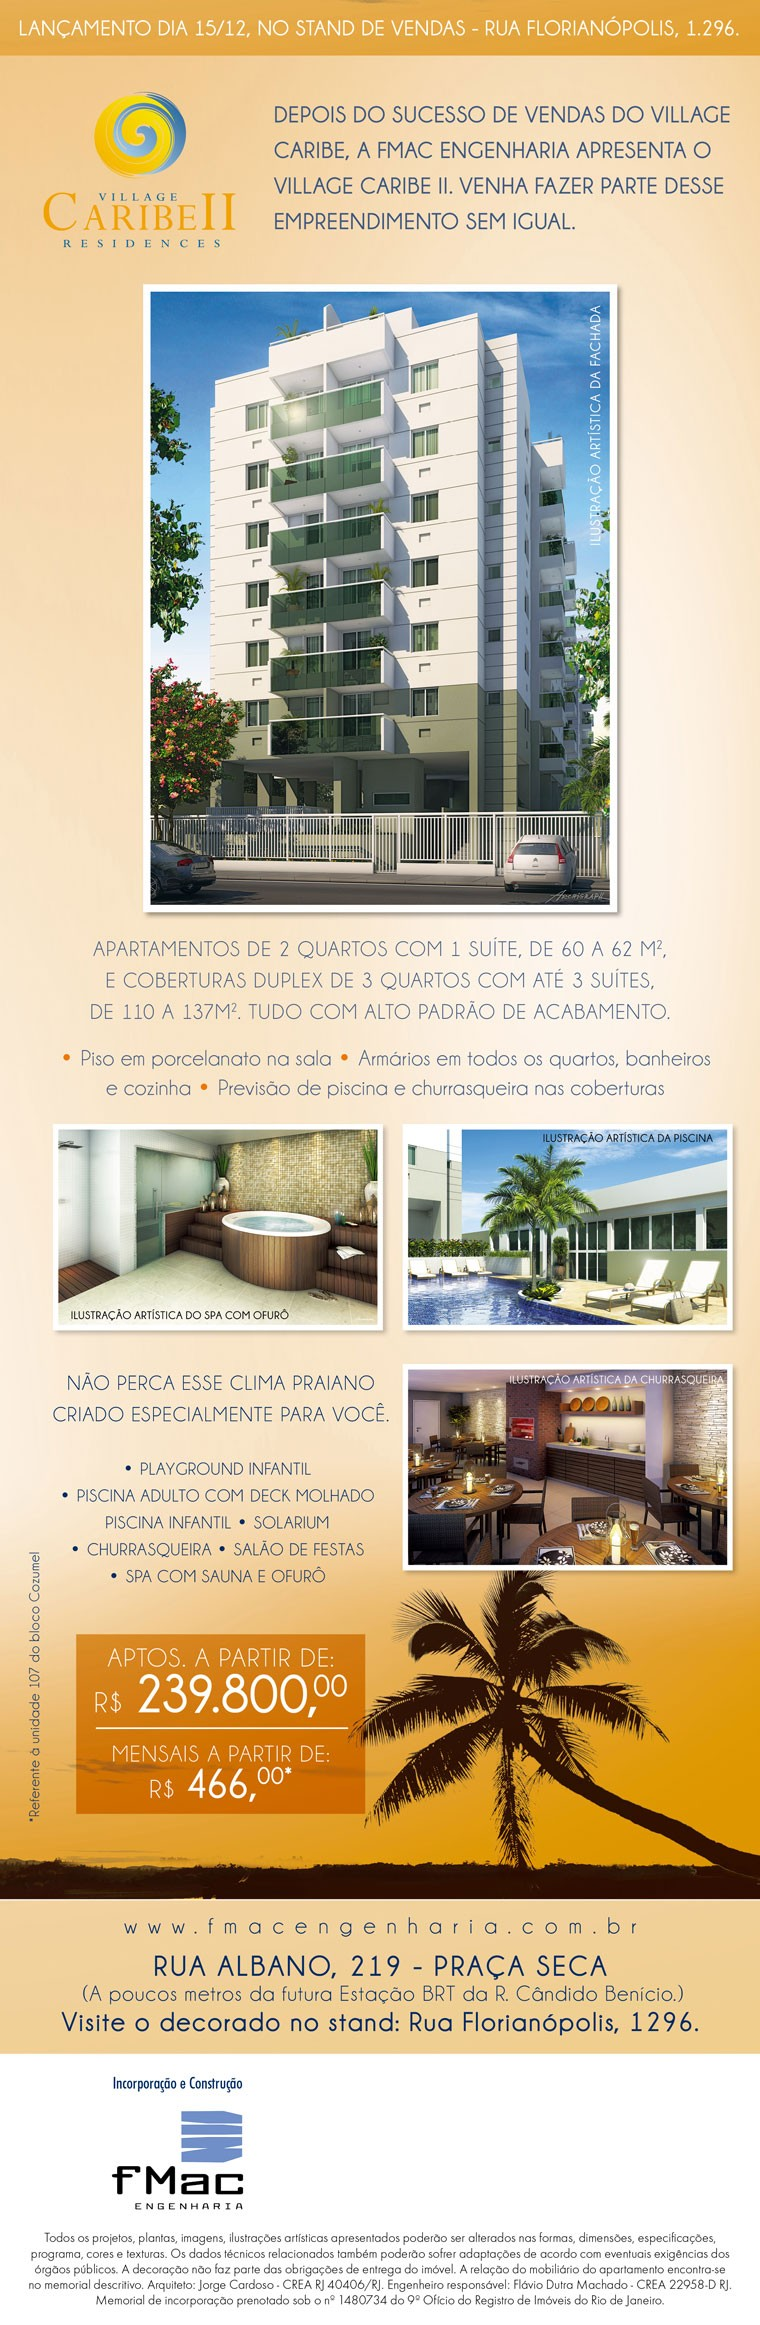 Email Marketing - Village Caribe 2